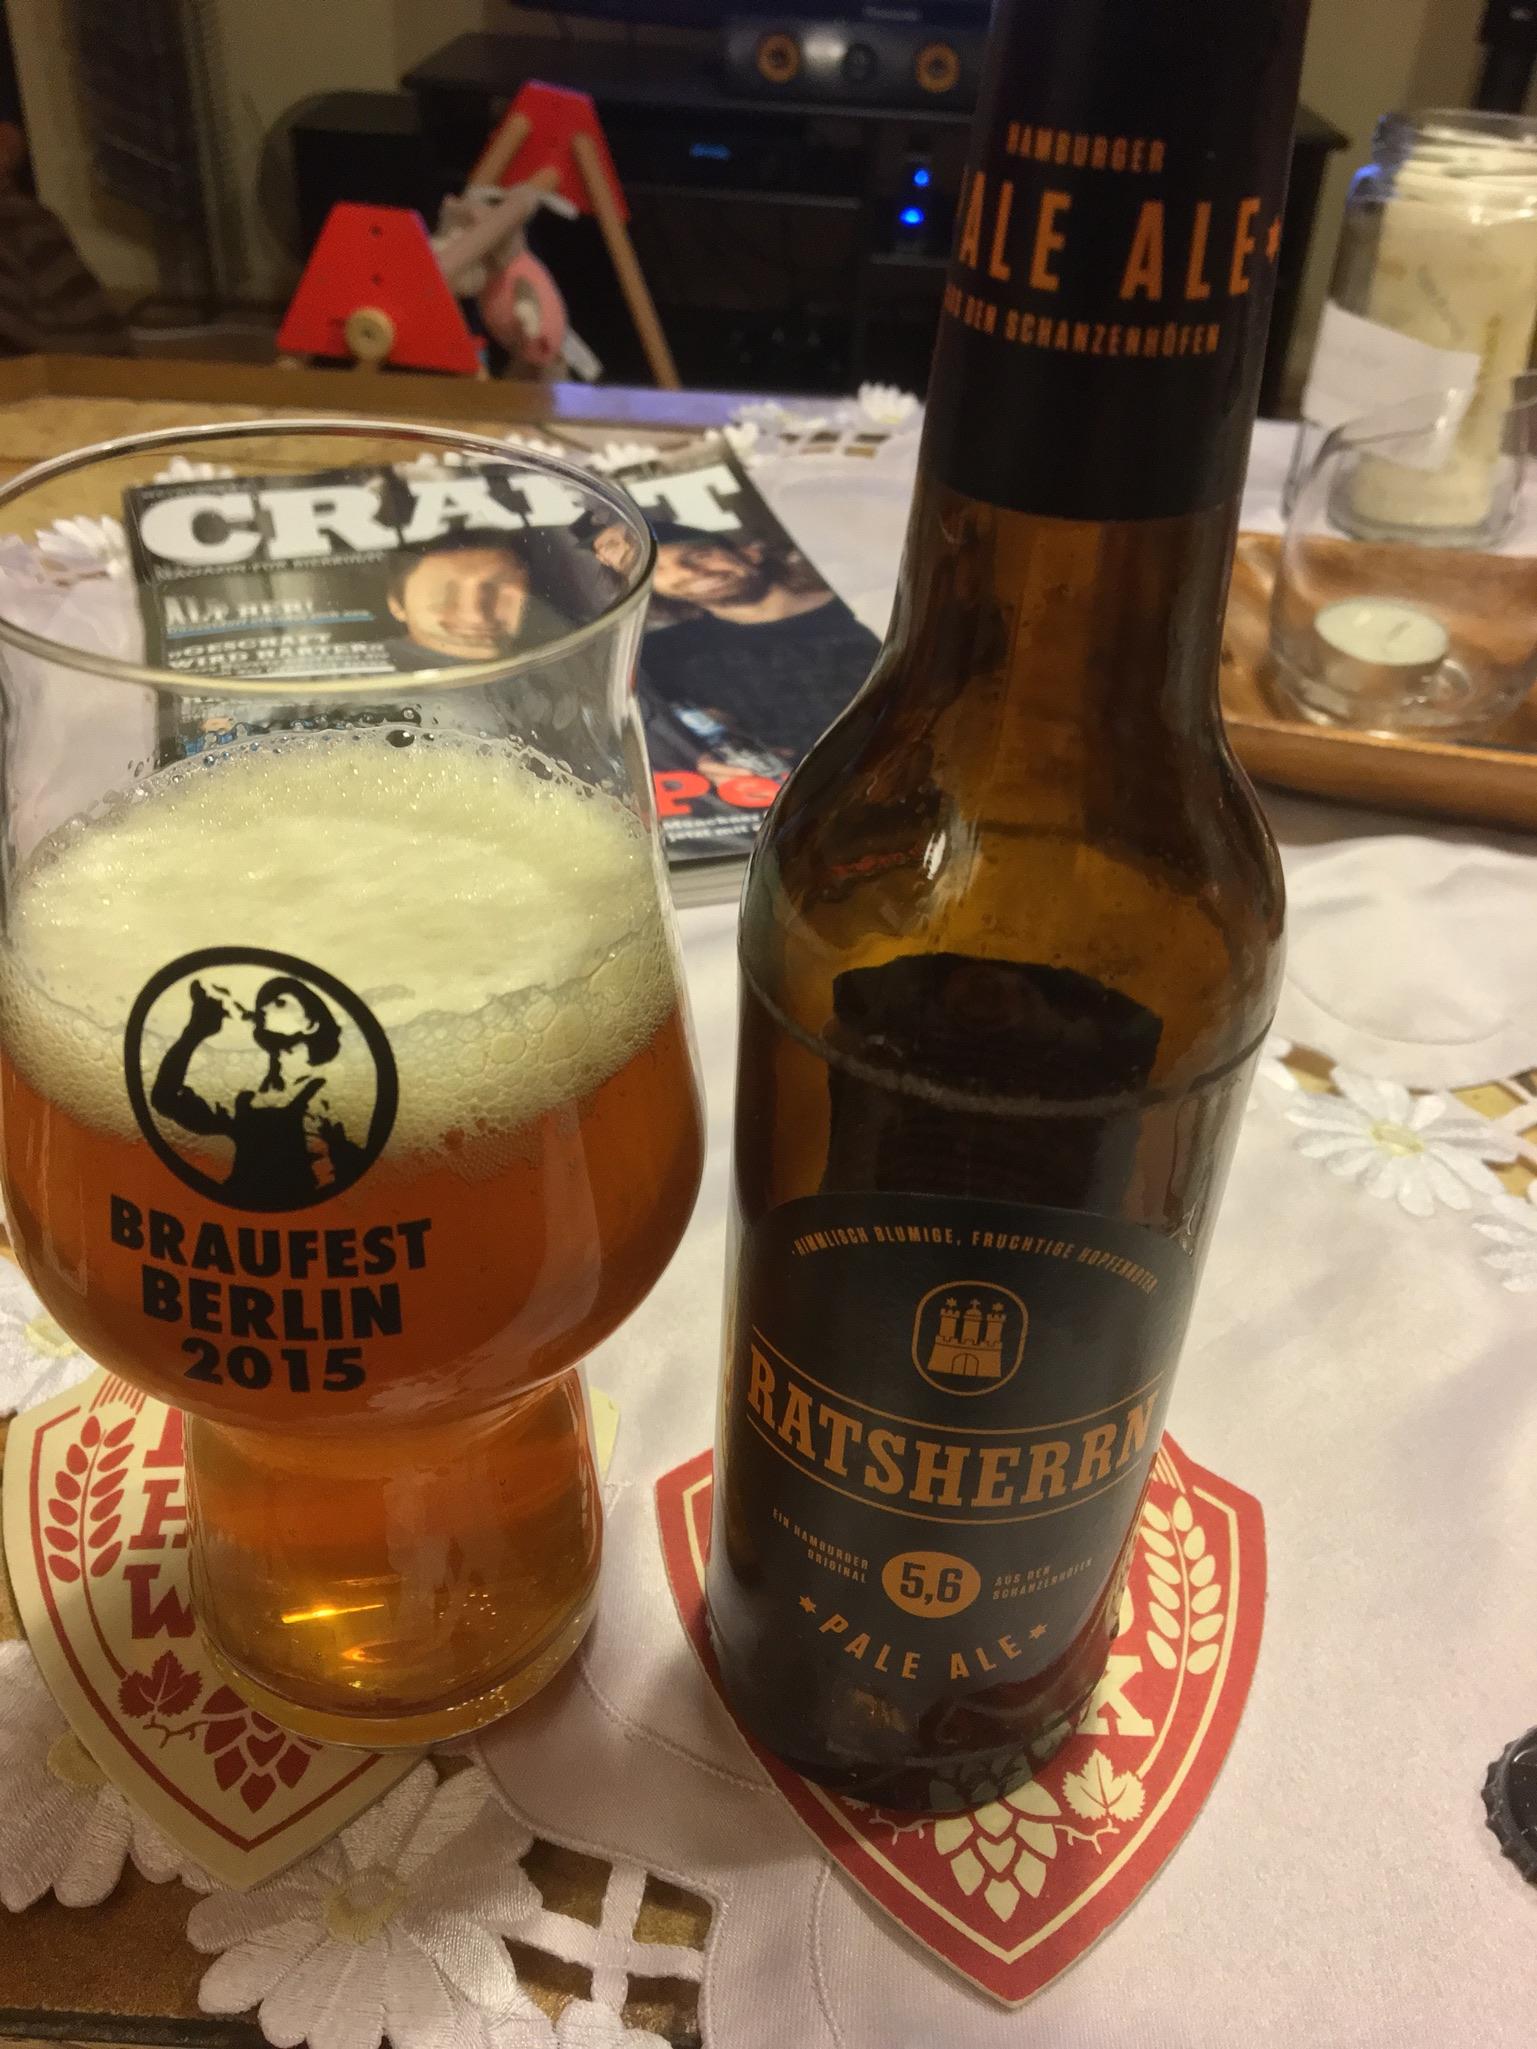 Ratsherrn – Pale Ale